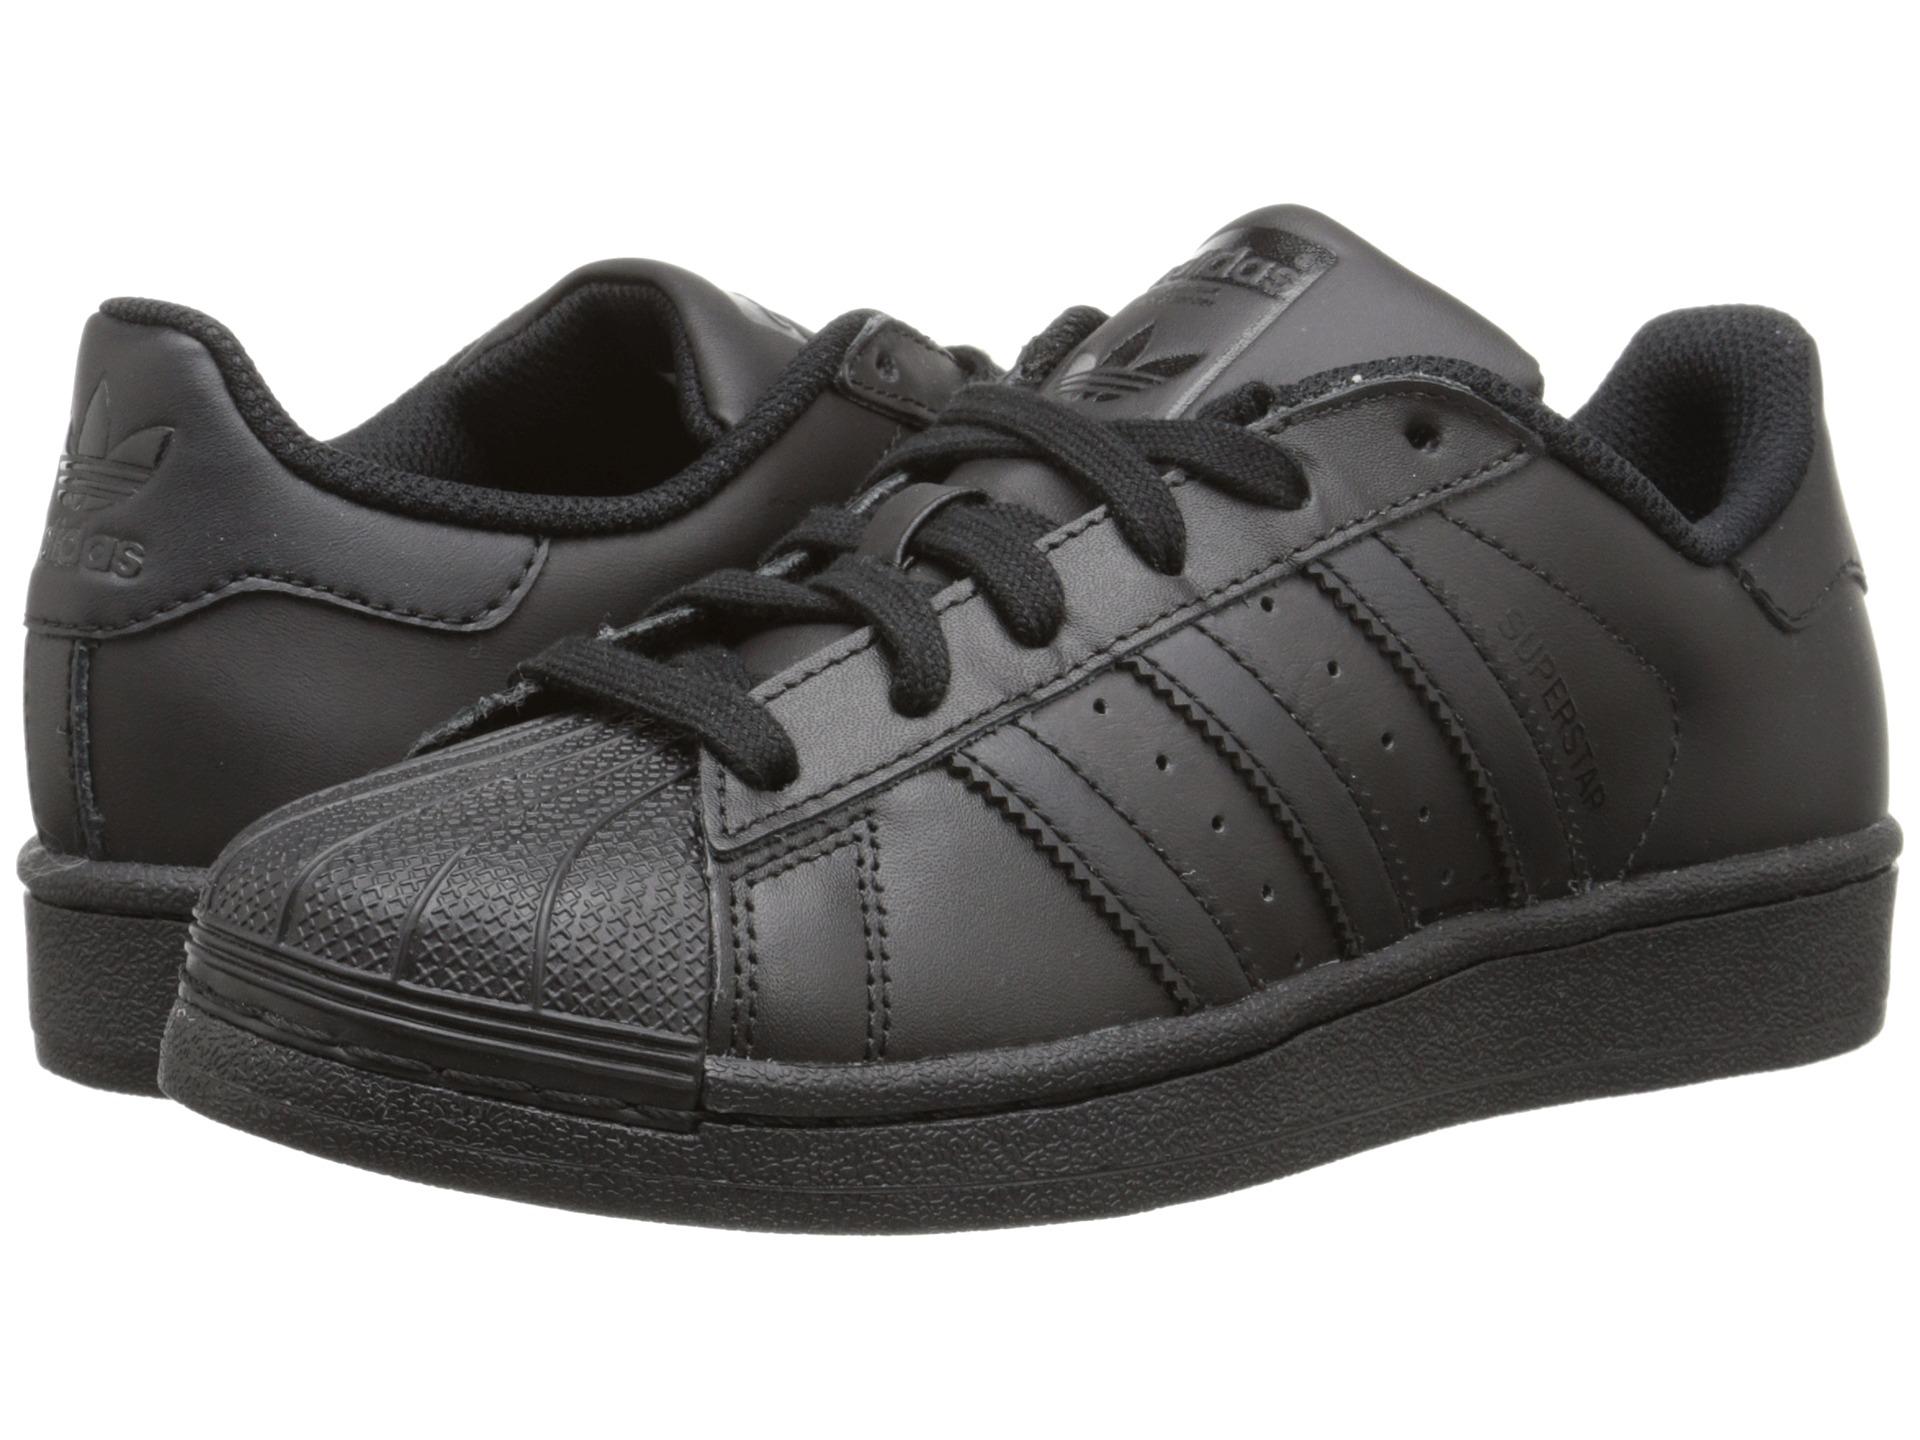 d5eb9f3c8d8 wholesale sims 3 adidas superstar 7505a dce5f  cheapest adidas superstar 2  kids black e98b4 e79ab